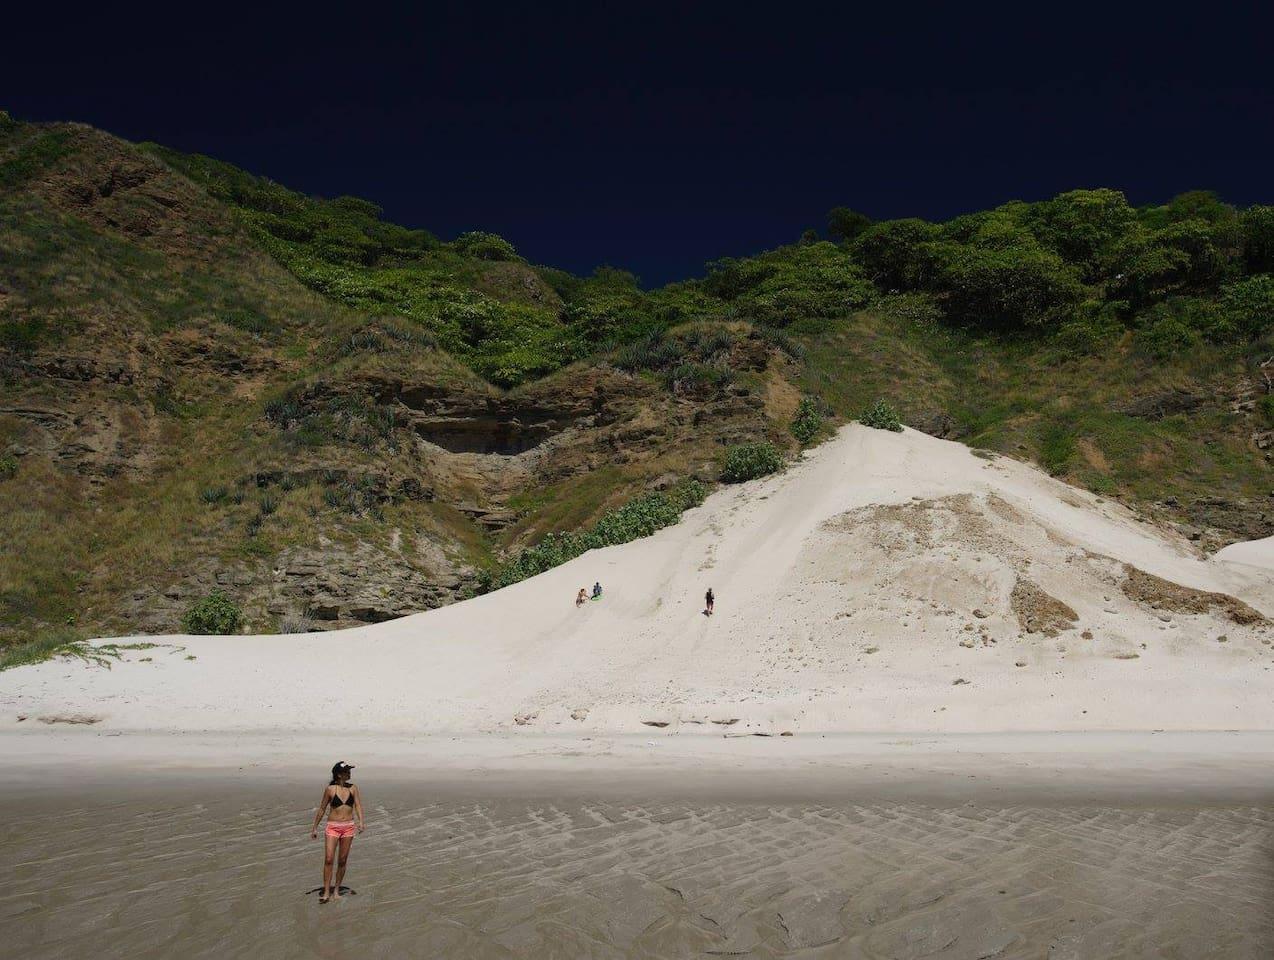 Sand dune hike and fun.